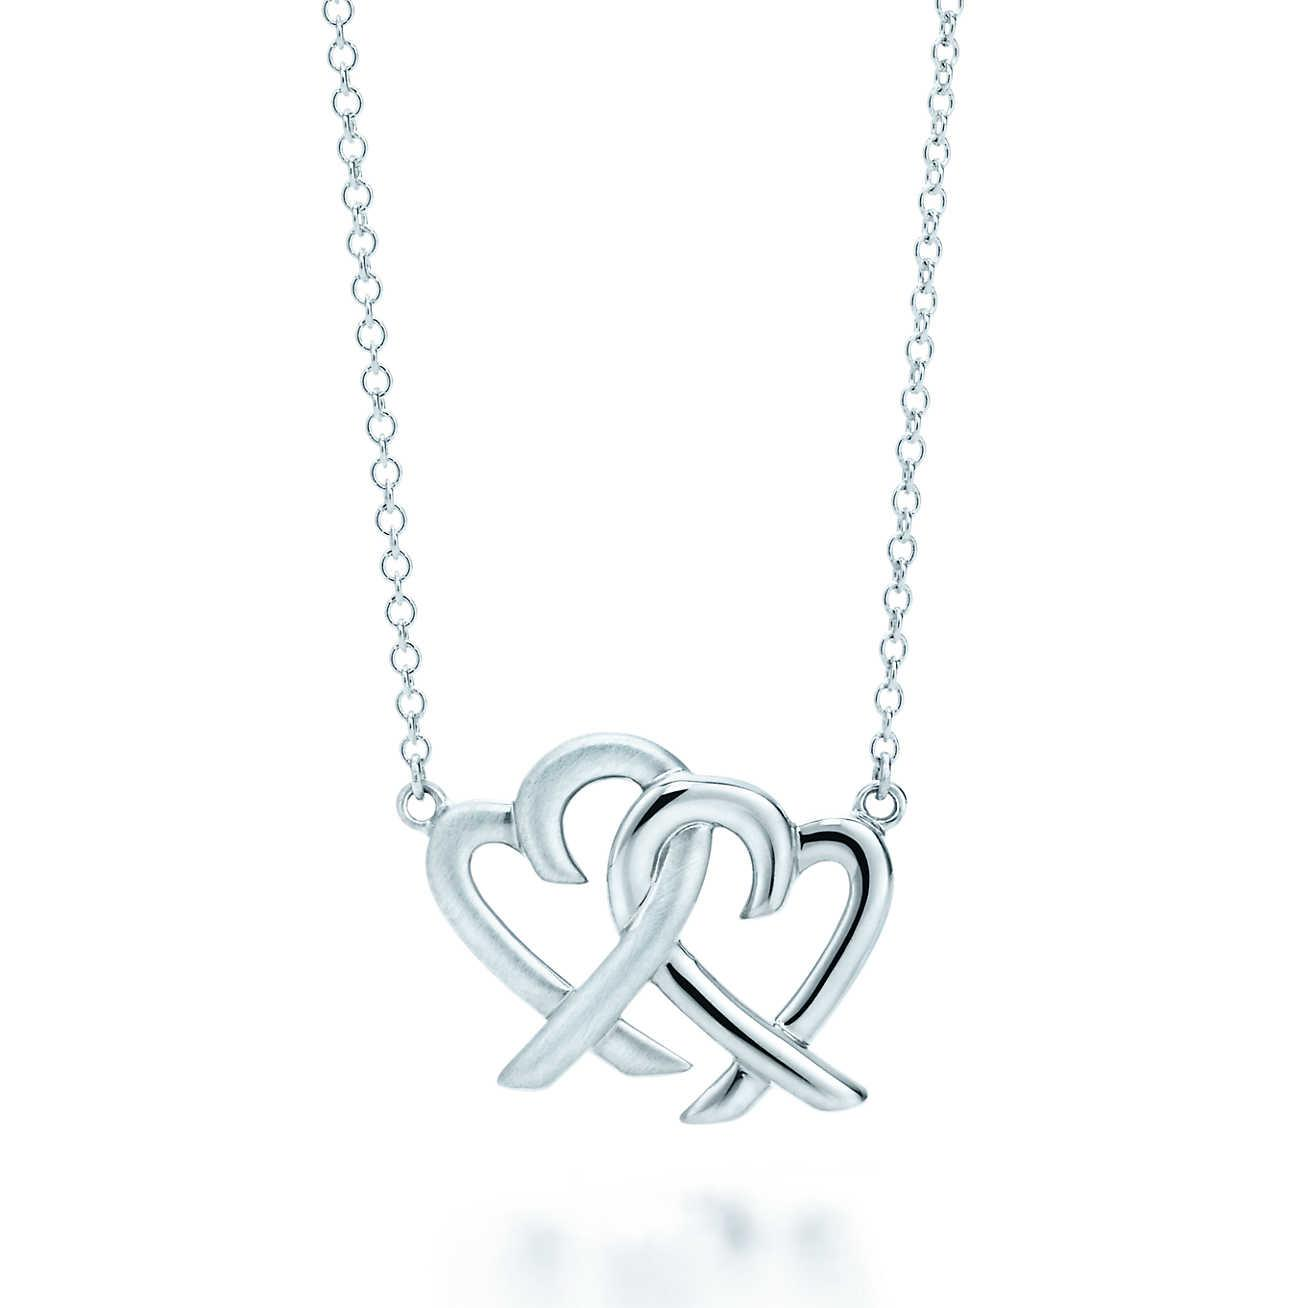 748a6758c Tap to visit site. Tiffany & Co - Metallic Loving Heart Interlocking Pendant  ...